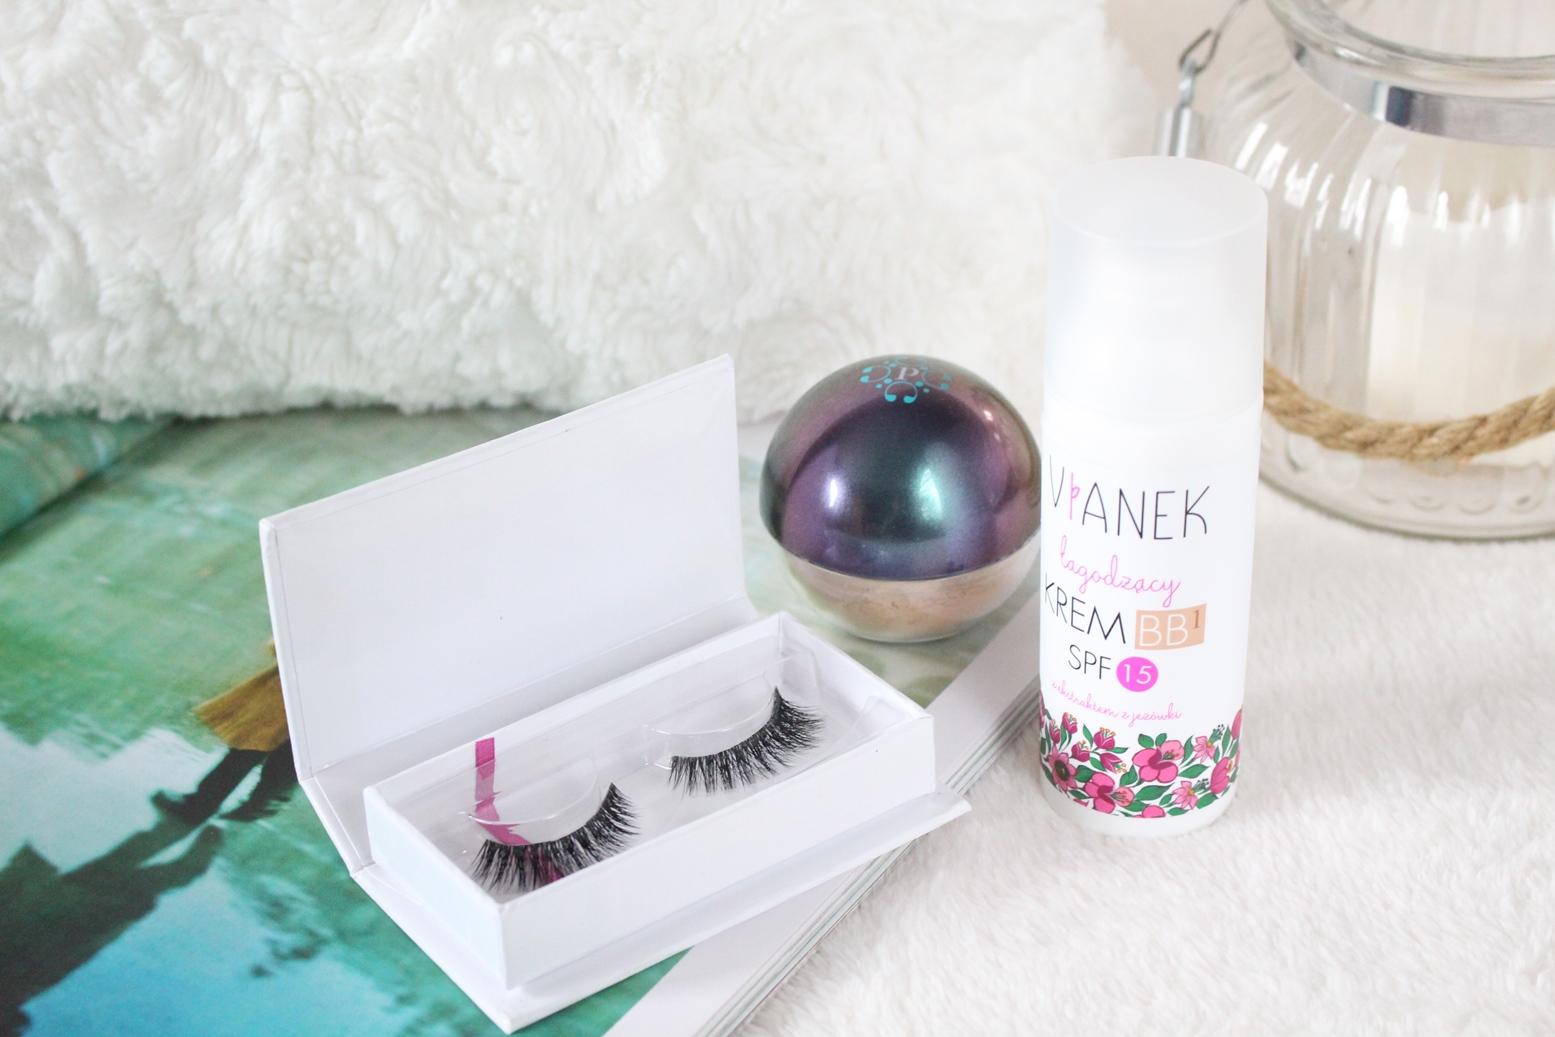 vianek-krem-bb-glamlash-pixie-cosmetics